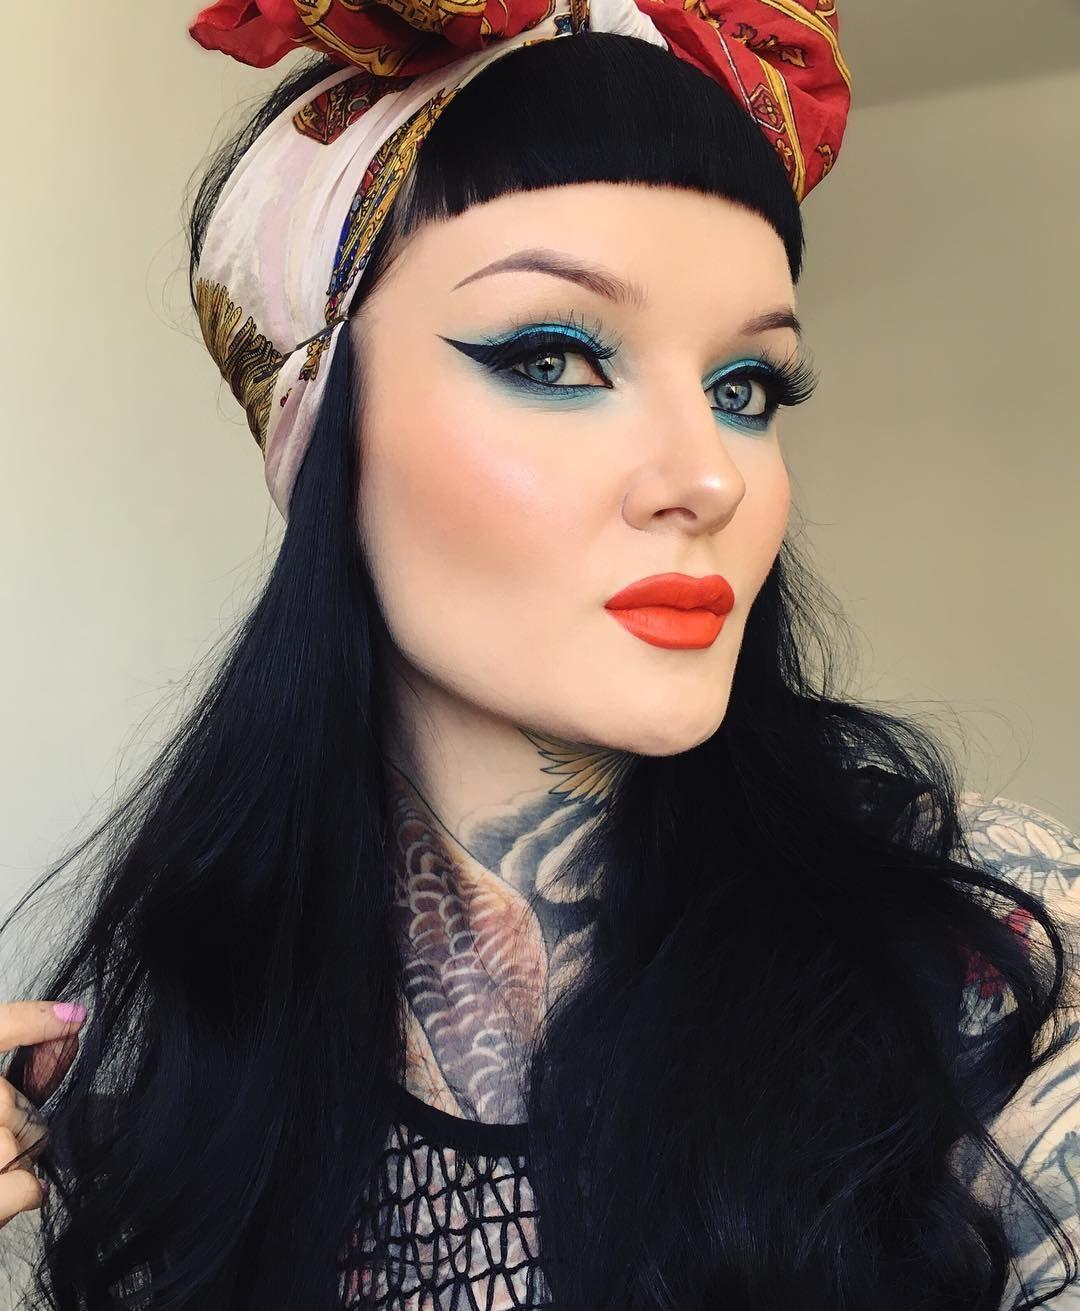 Professional Makeup Artist  From Finland - currently based in London, UK   ida@ida-ekman.com